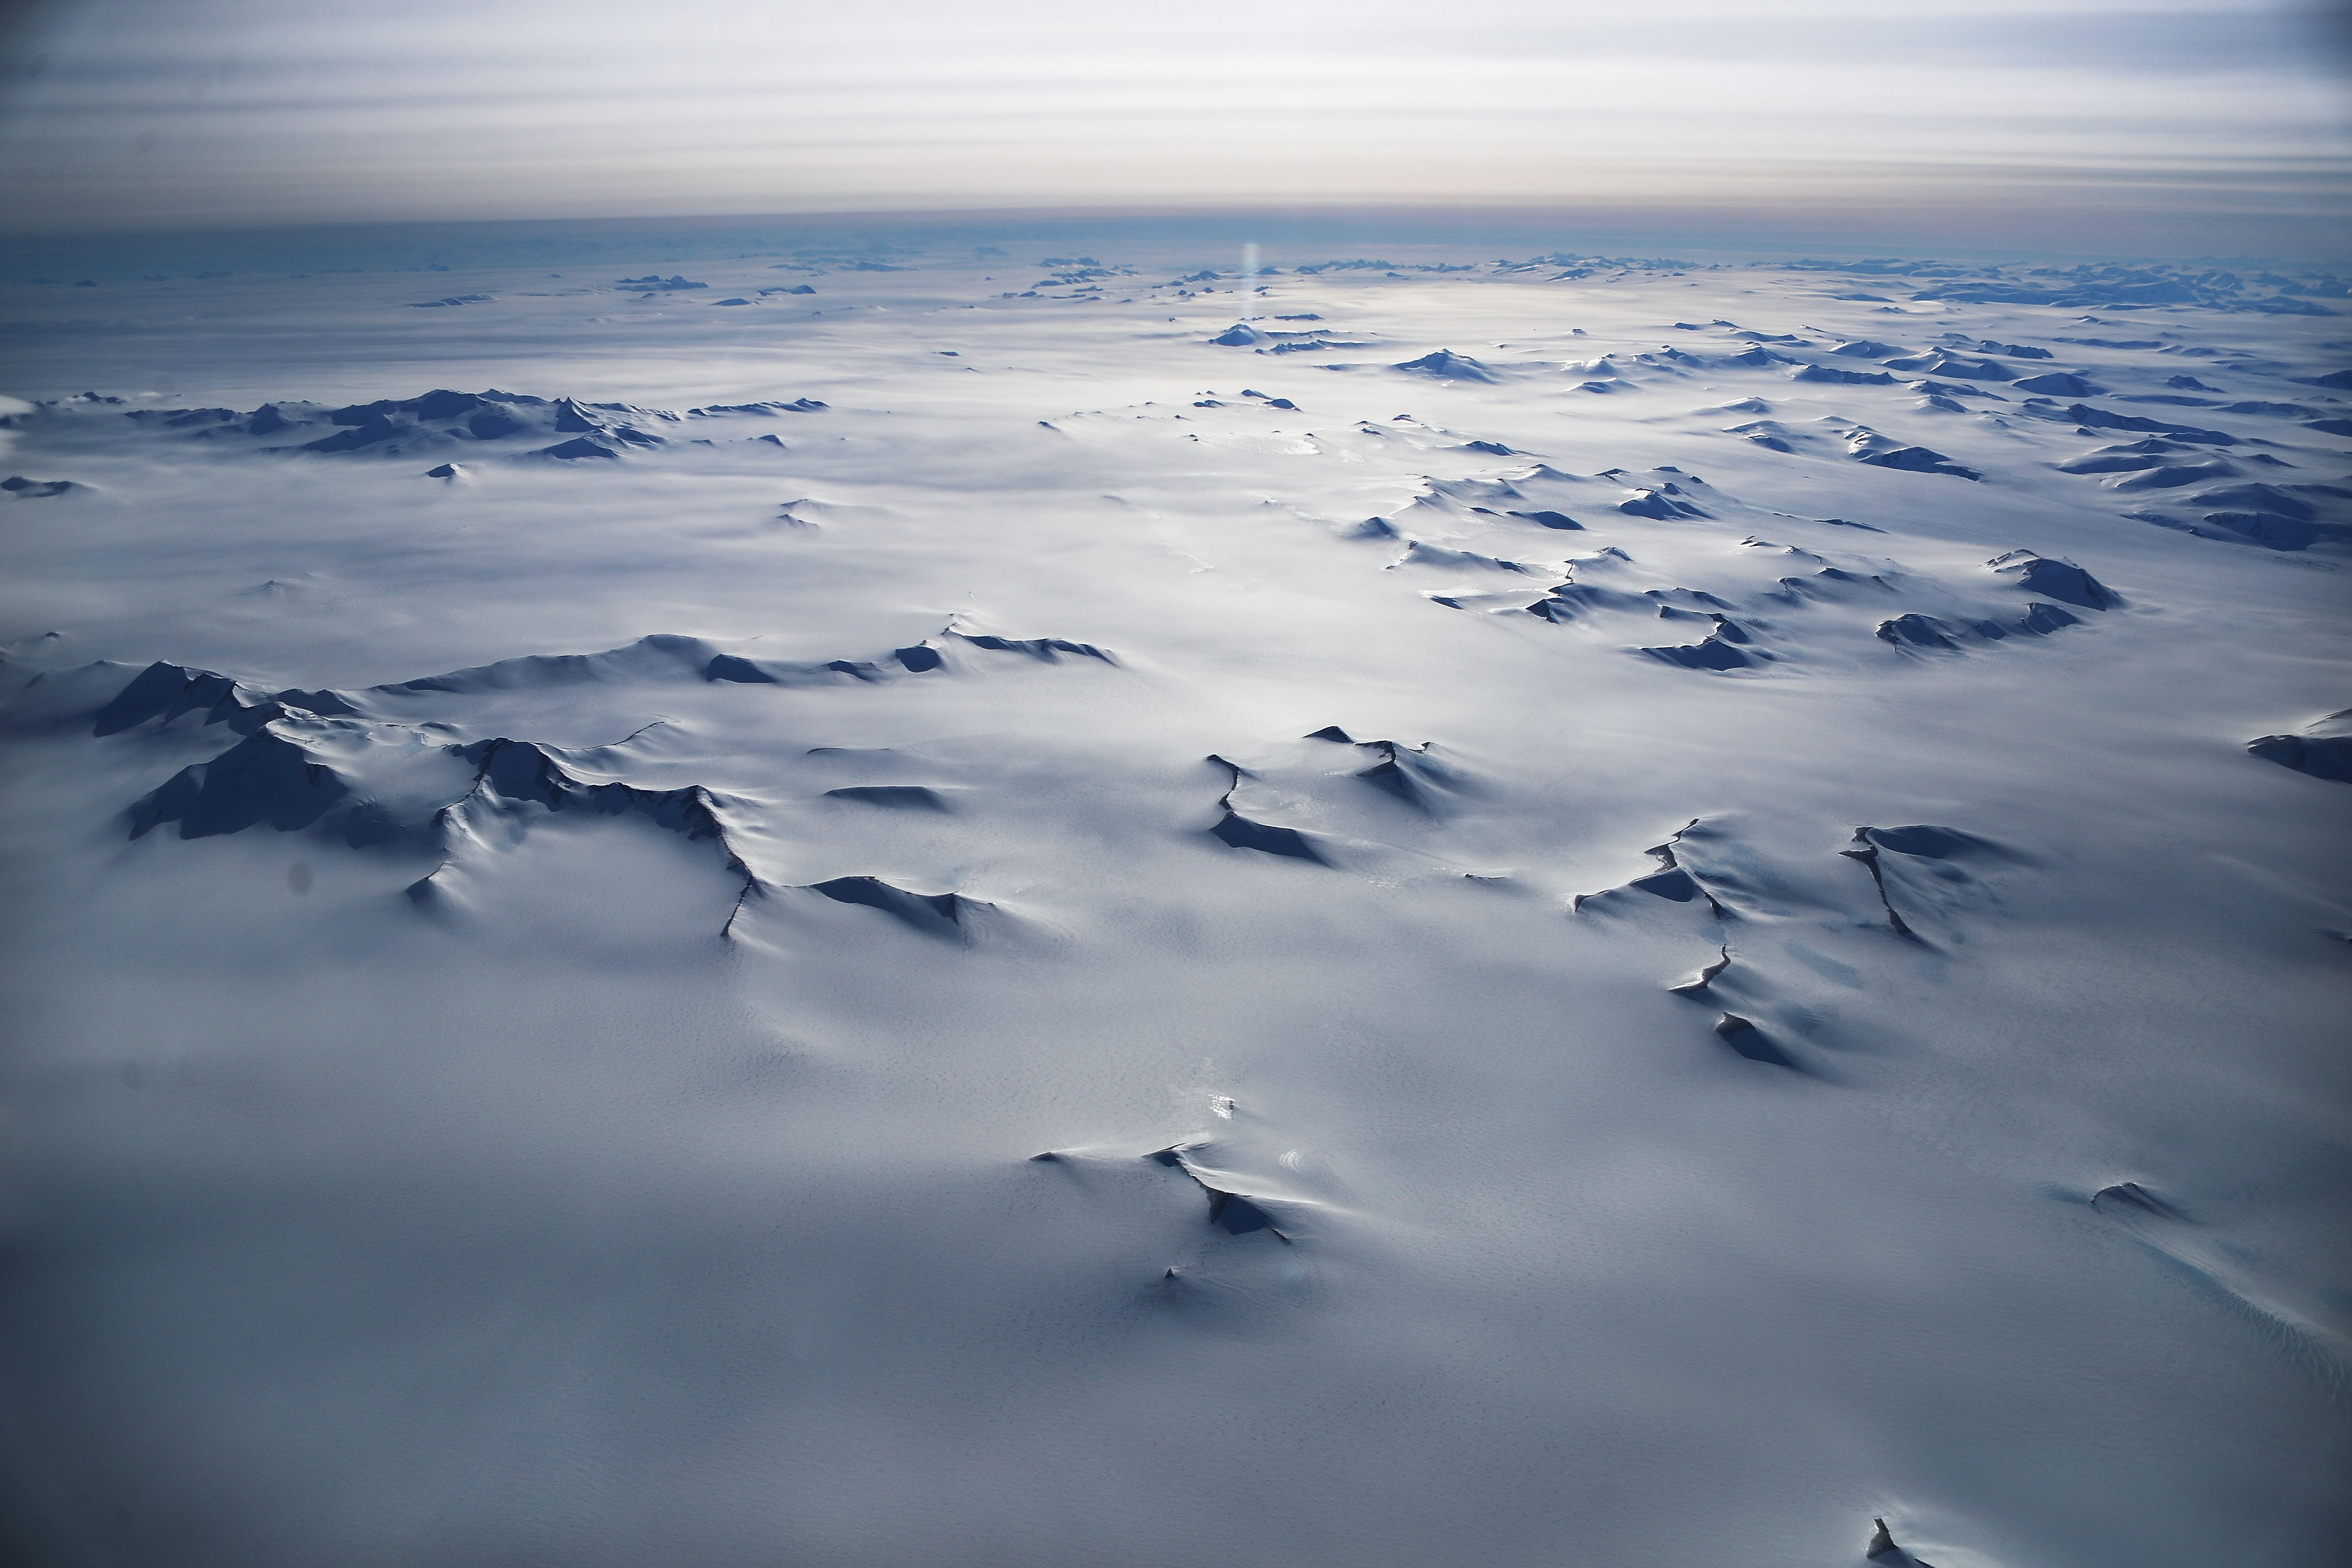 Antarctica has its 1st COVID-19 outbreak 7EbnDSPMc53gveet2L8KUm